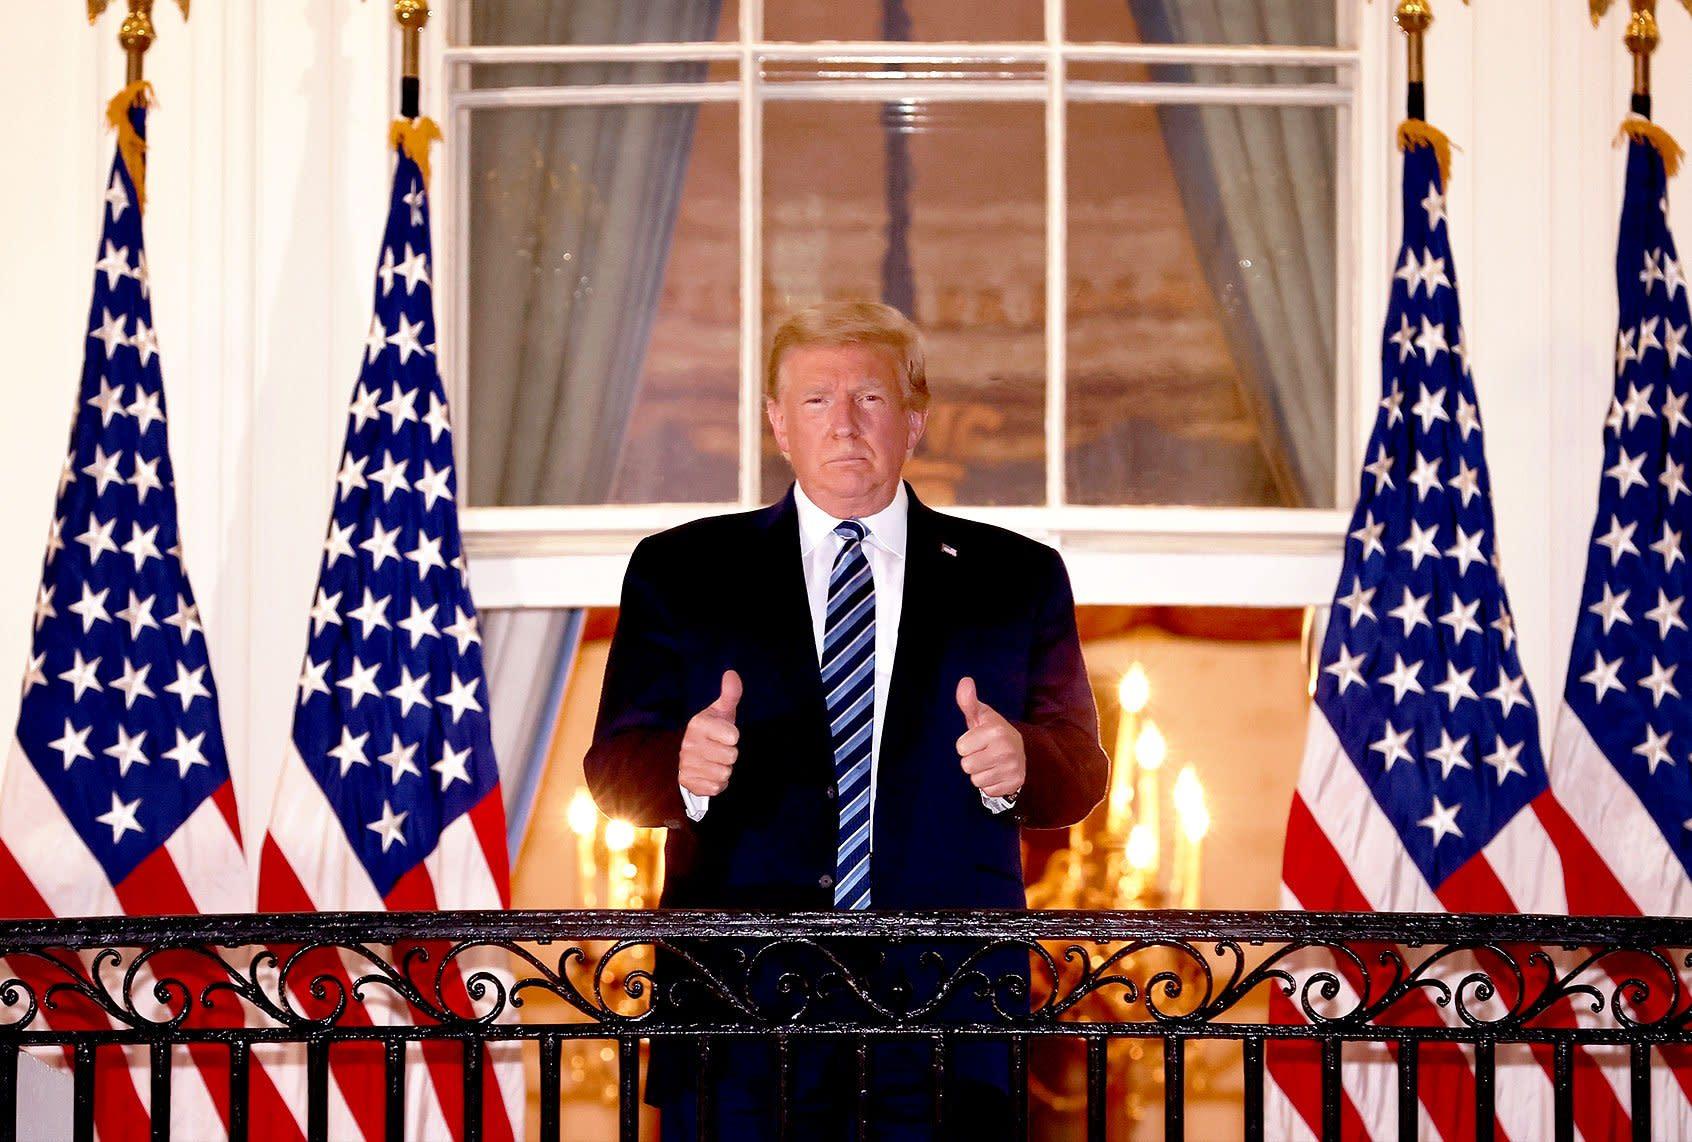 """Sociopathy"": Psychiatrist says Trump's behavior ""meets criteria for a locked psychiatric facility"